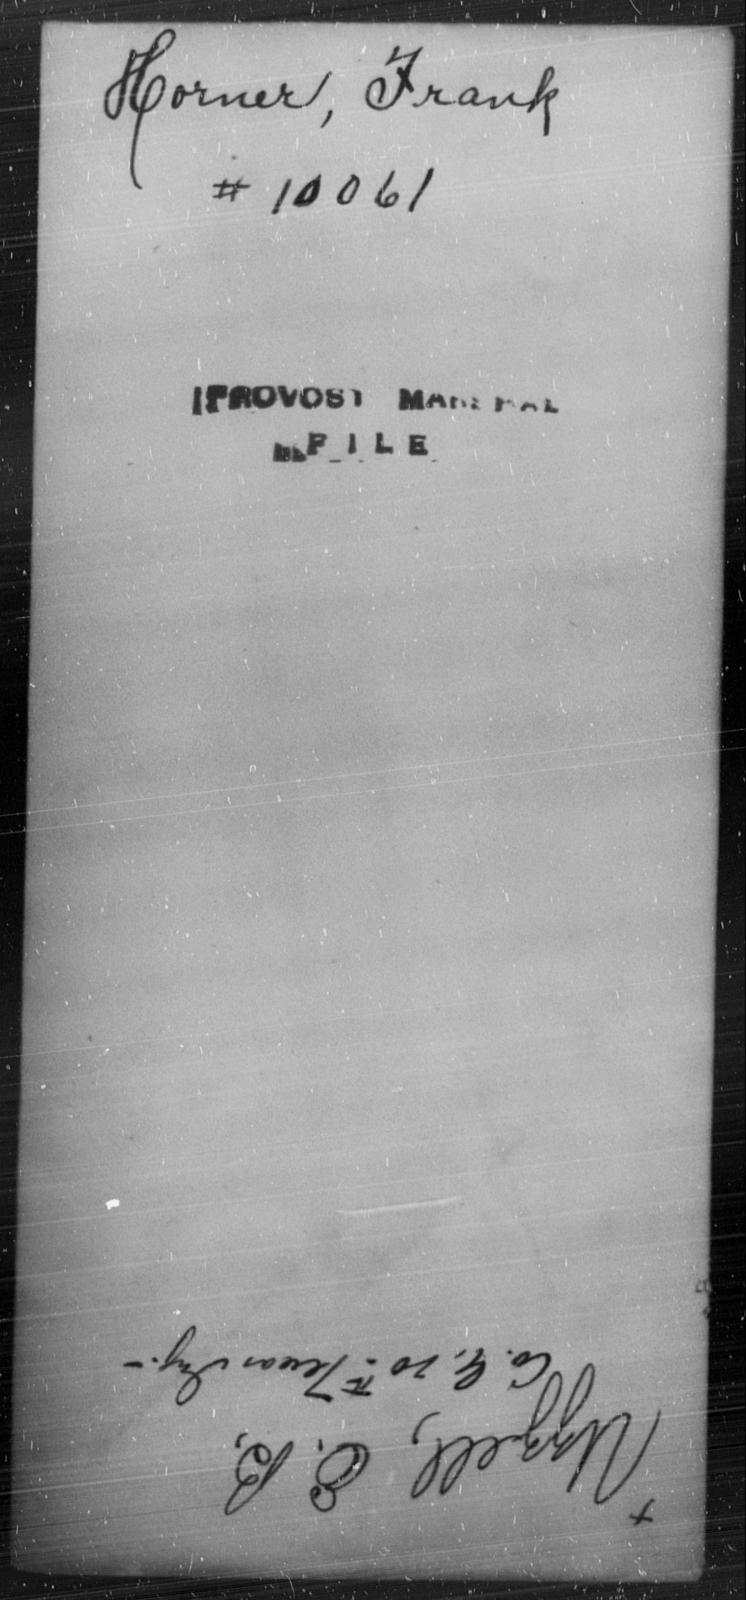 Horner, Frank - State: [Blank] - Year: [Blank]